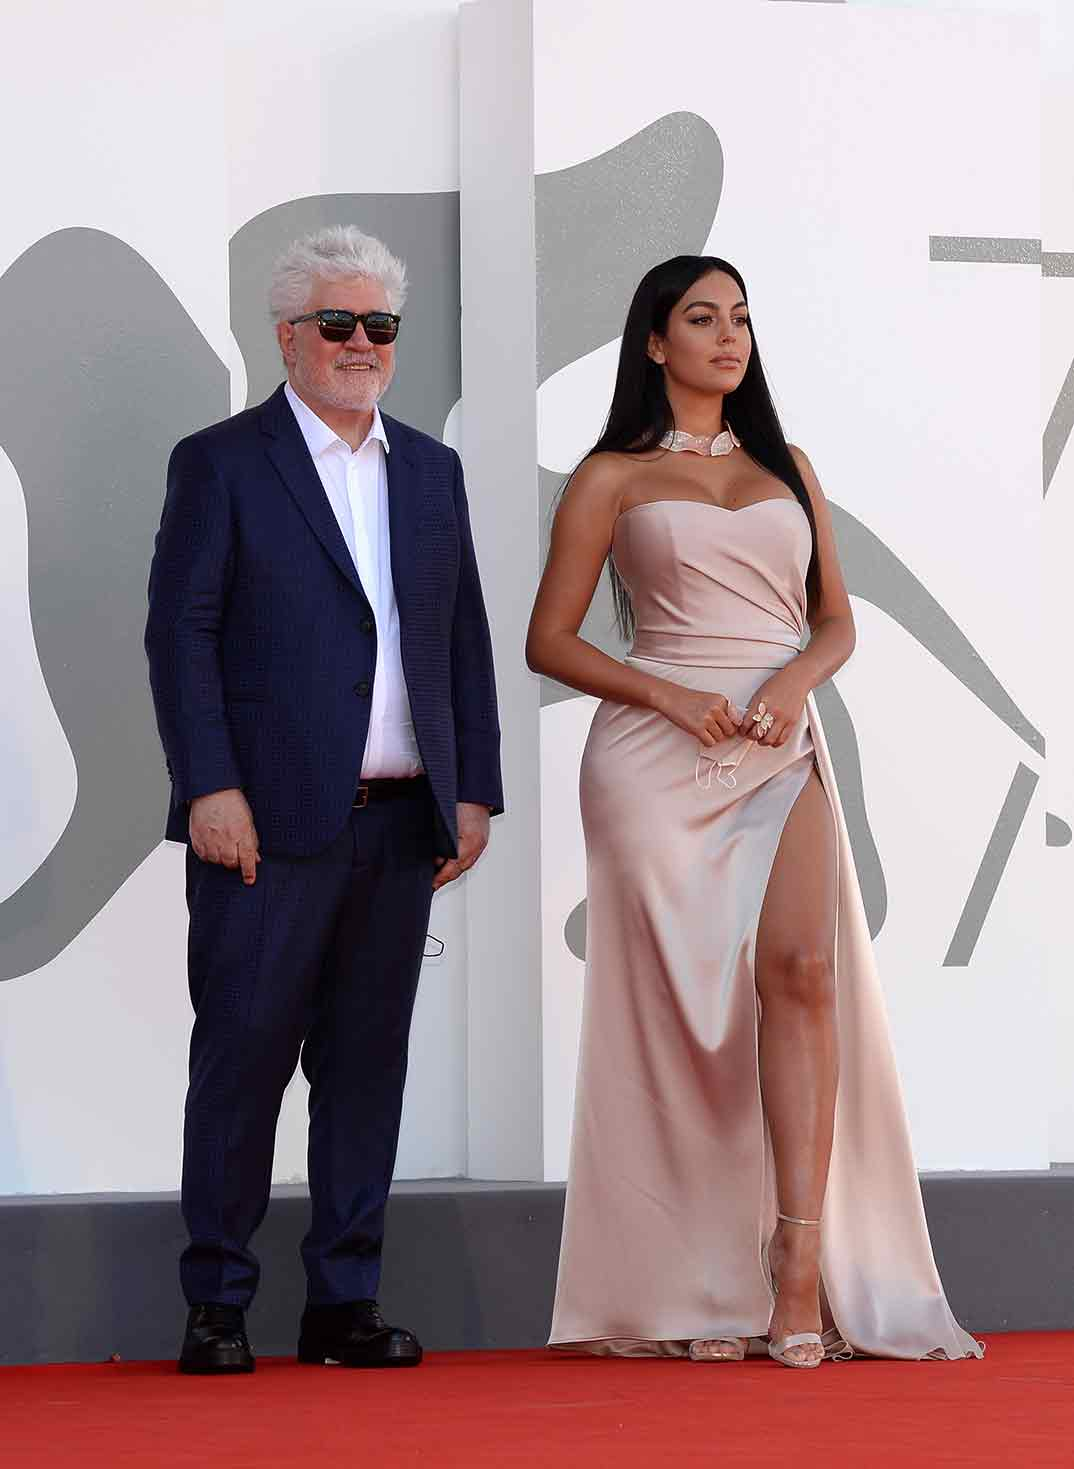 Pedro Almodóvar y Georgina Rodríguez- Festival de cine de Venecia Credits La Biennale di Venezia © Foto ASAC, photo by Giorgio Zucchiatti